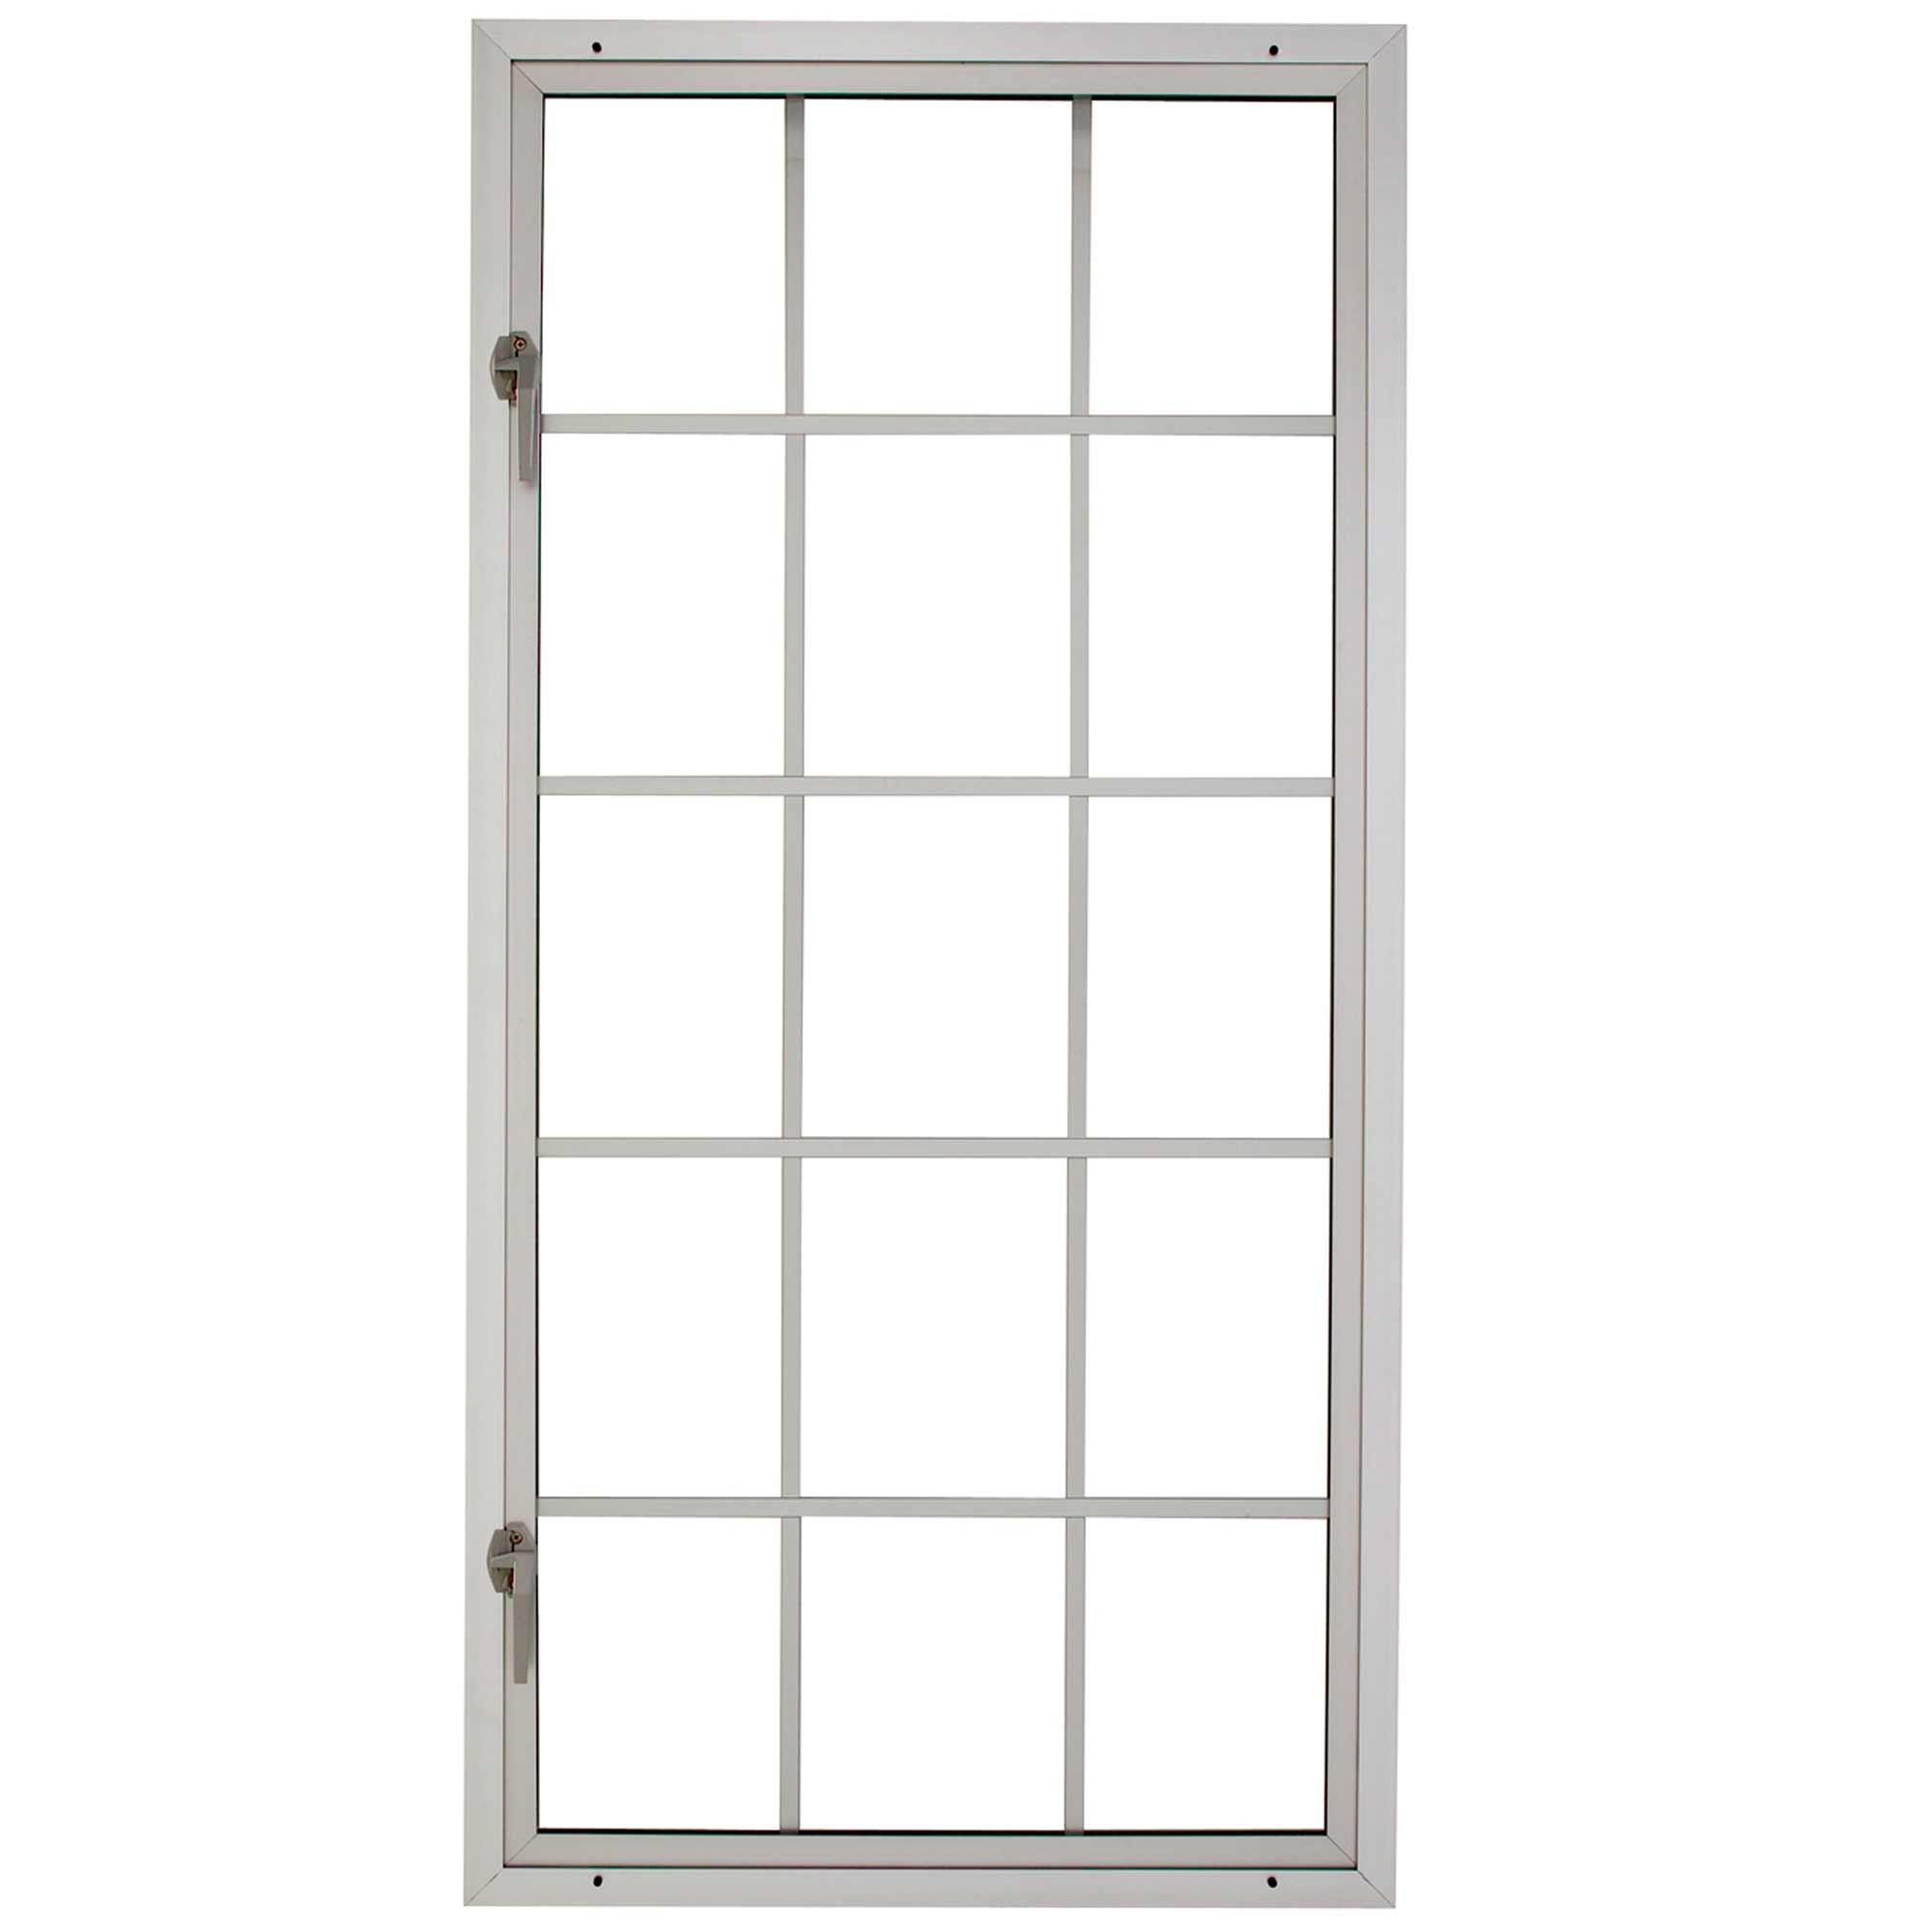 Milgard contemporary aluminum windows for open casement